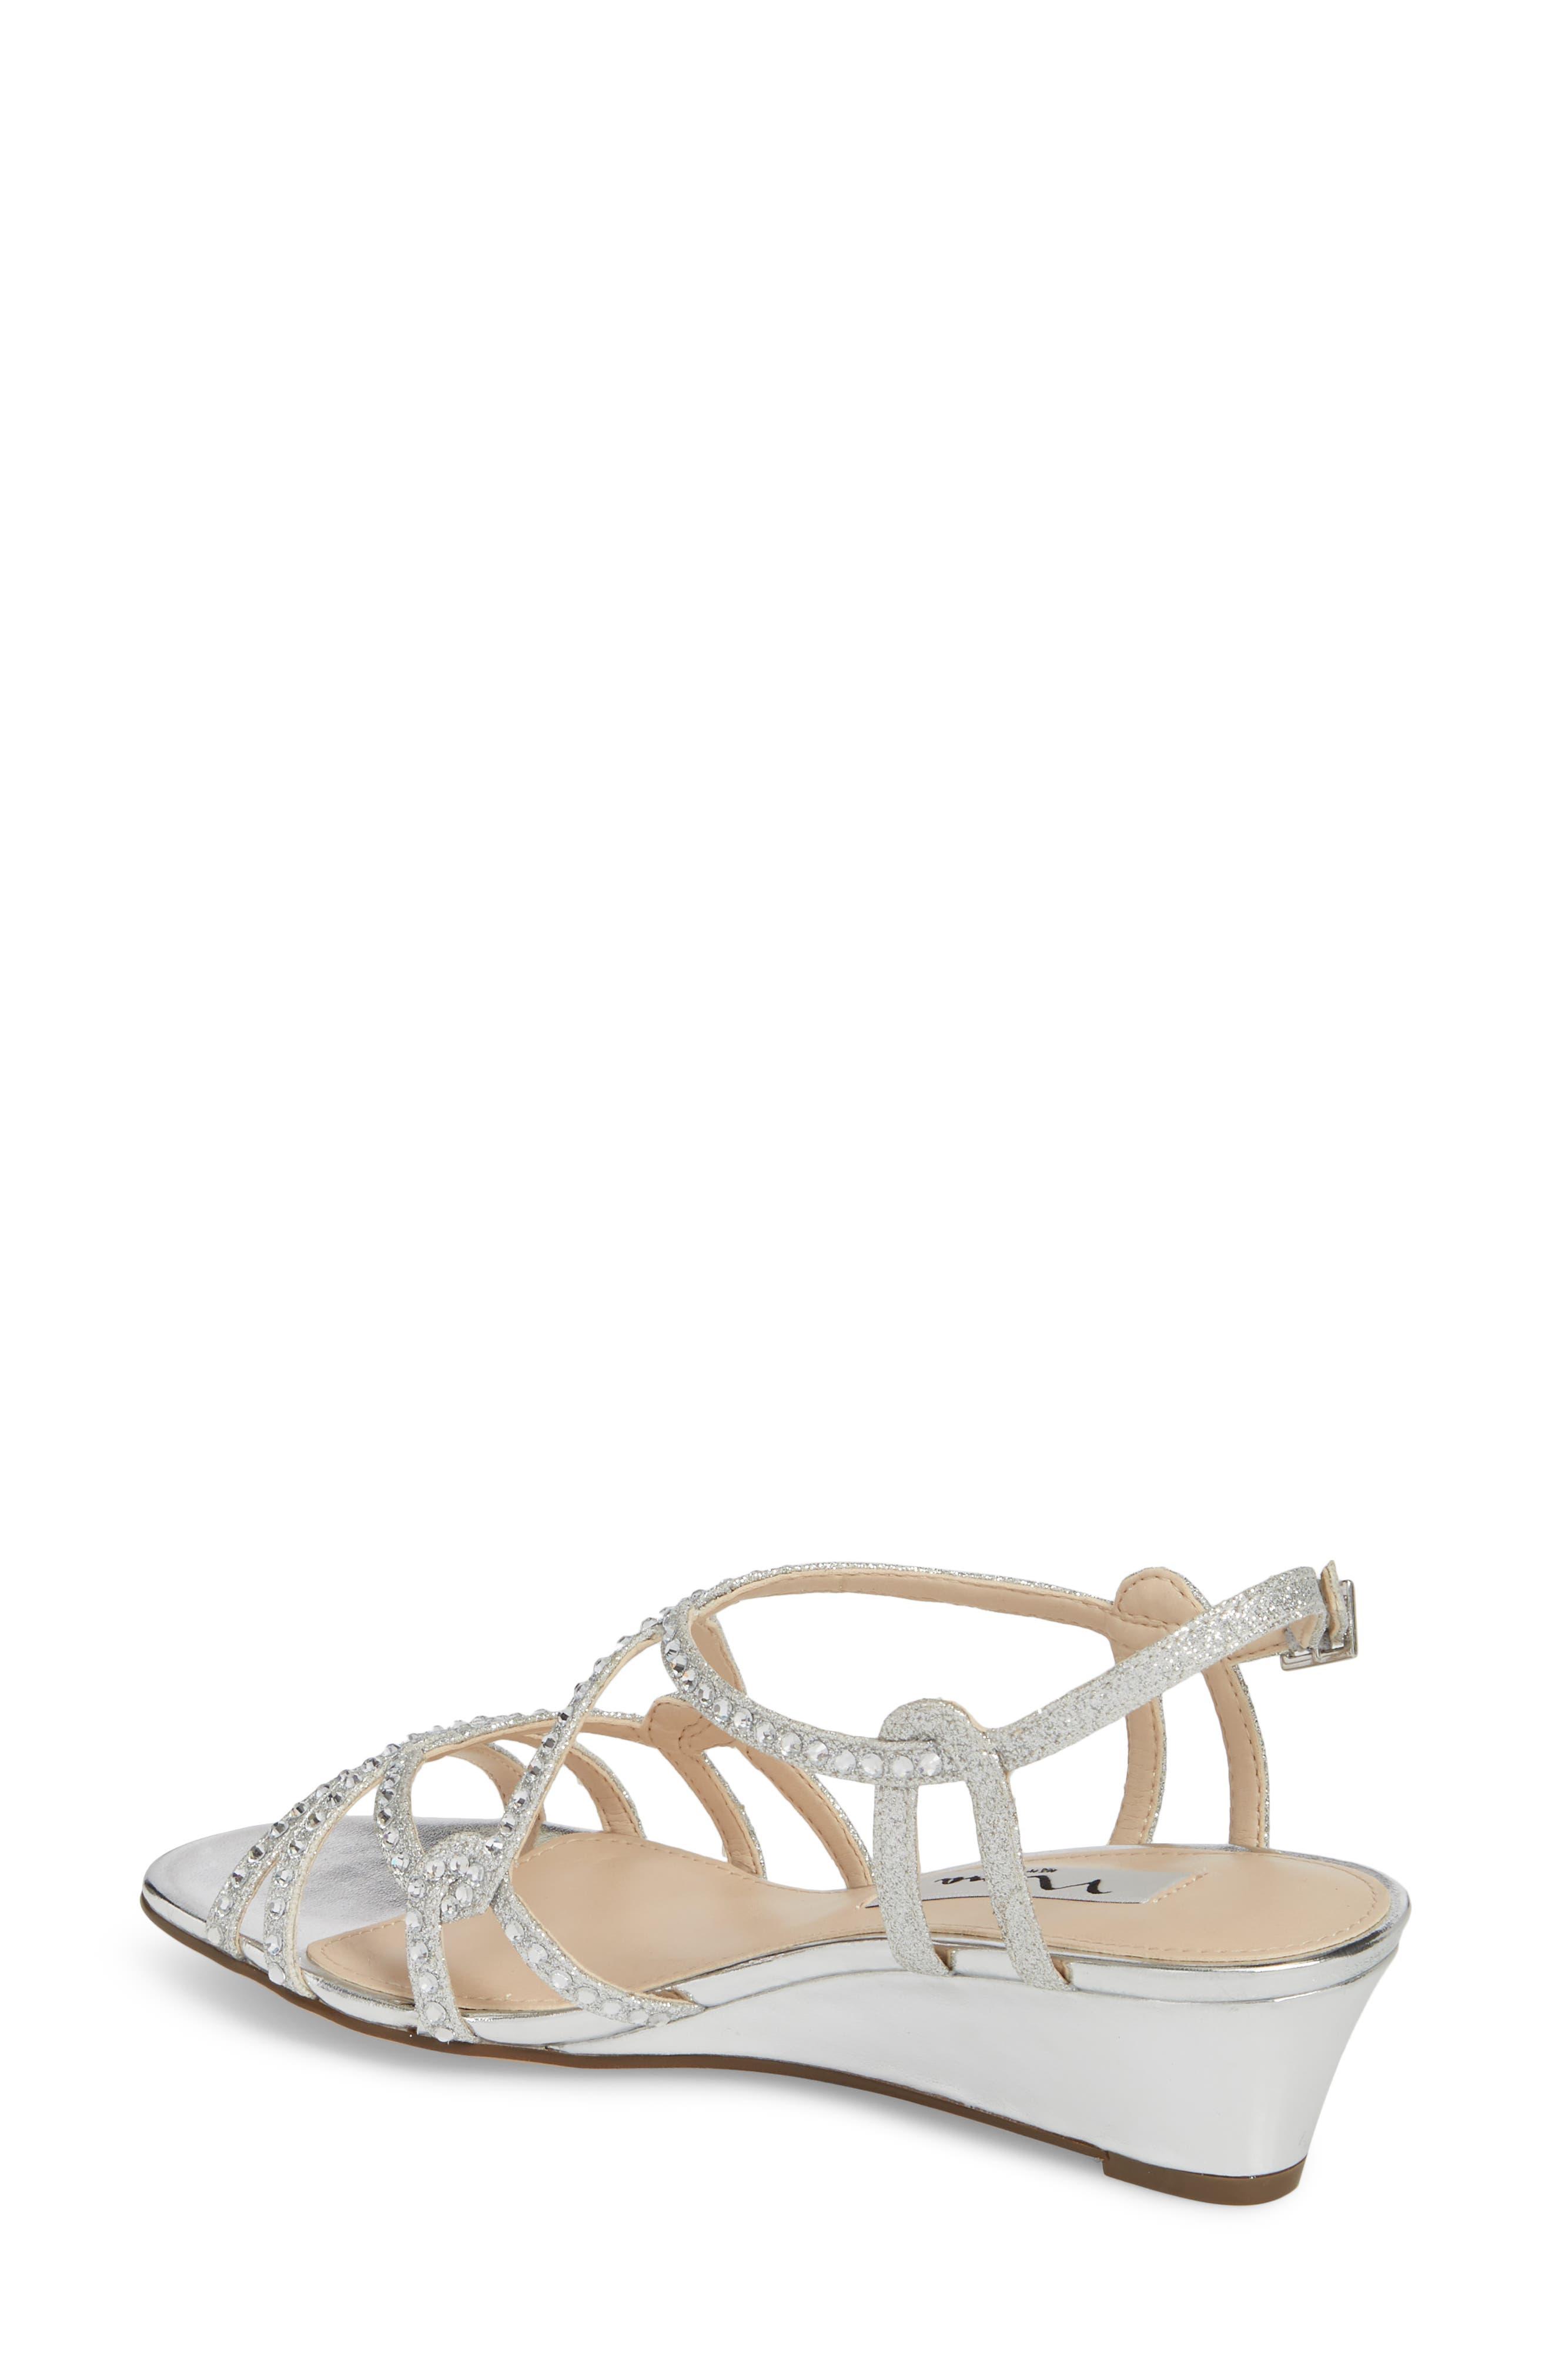 Finola Sandal,                             Alternate thumbnail 2, color,                             Silver Glitter Fabric